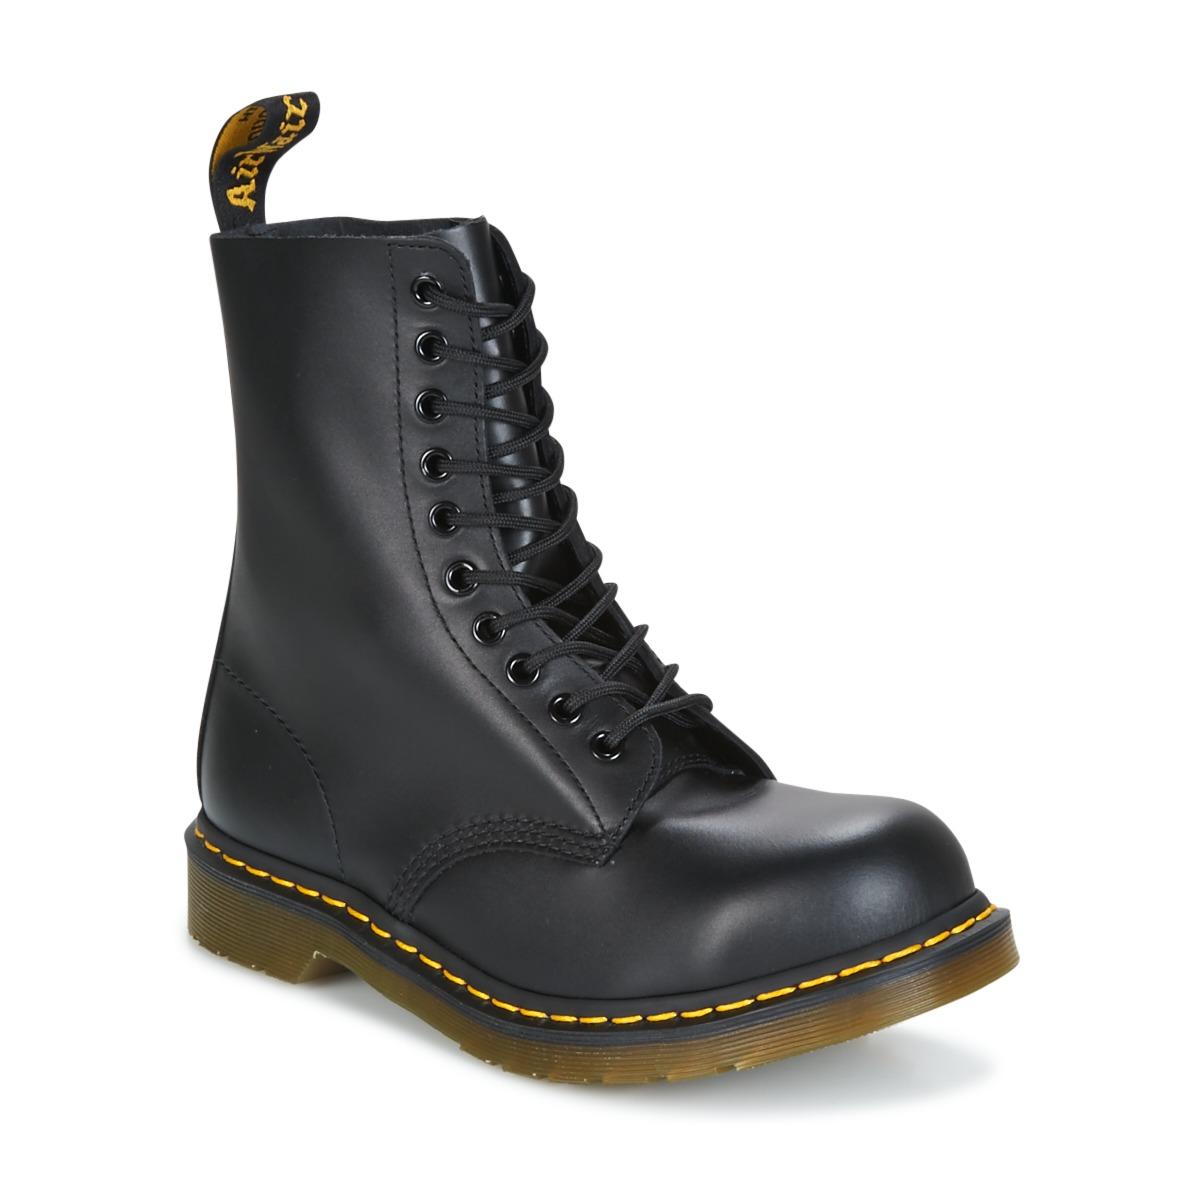 Dr Martens 1919 Black - Δωρεάν Αποστολή στο Spartoo.gr ! - Παπούτσια Μπότες  195 cbf190f7b84